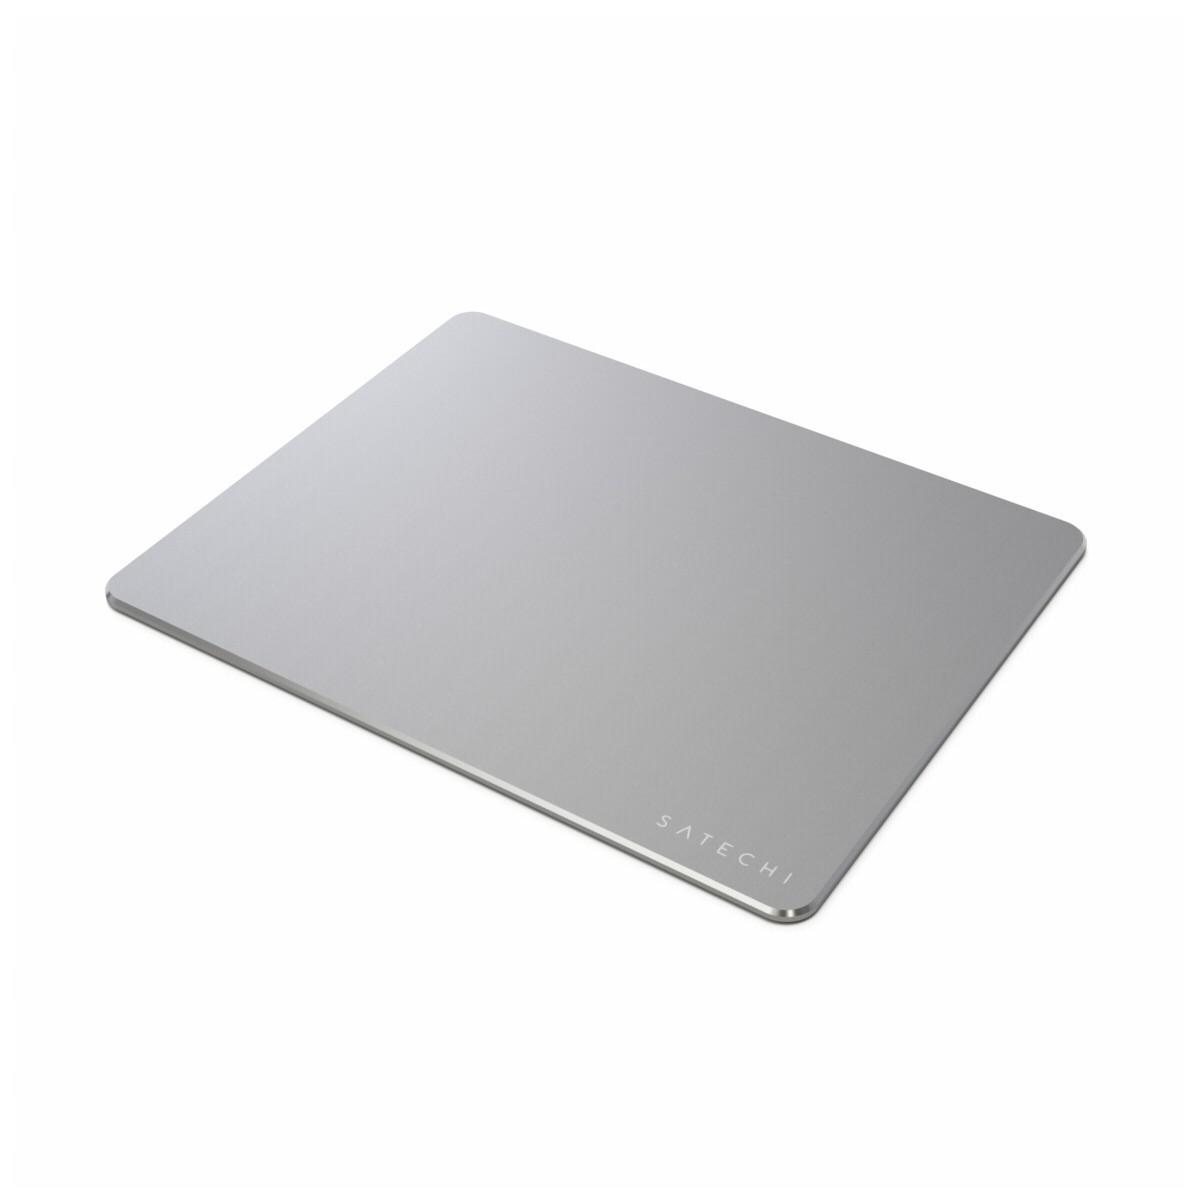 Satechi Aluminum Muis Pad Space Gray